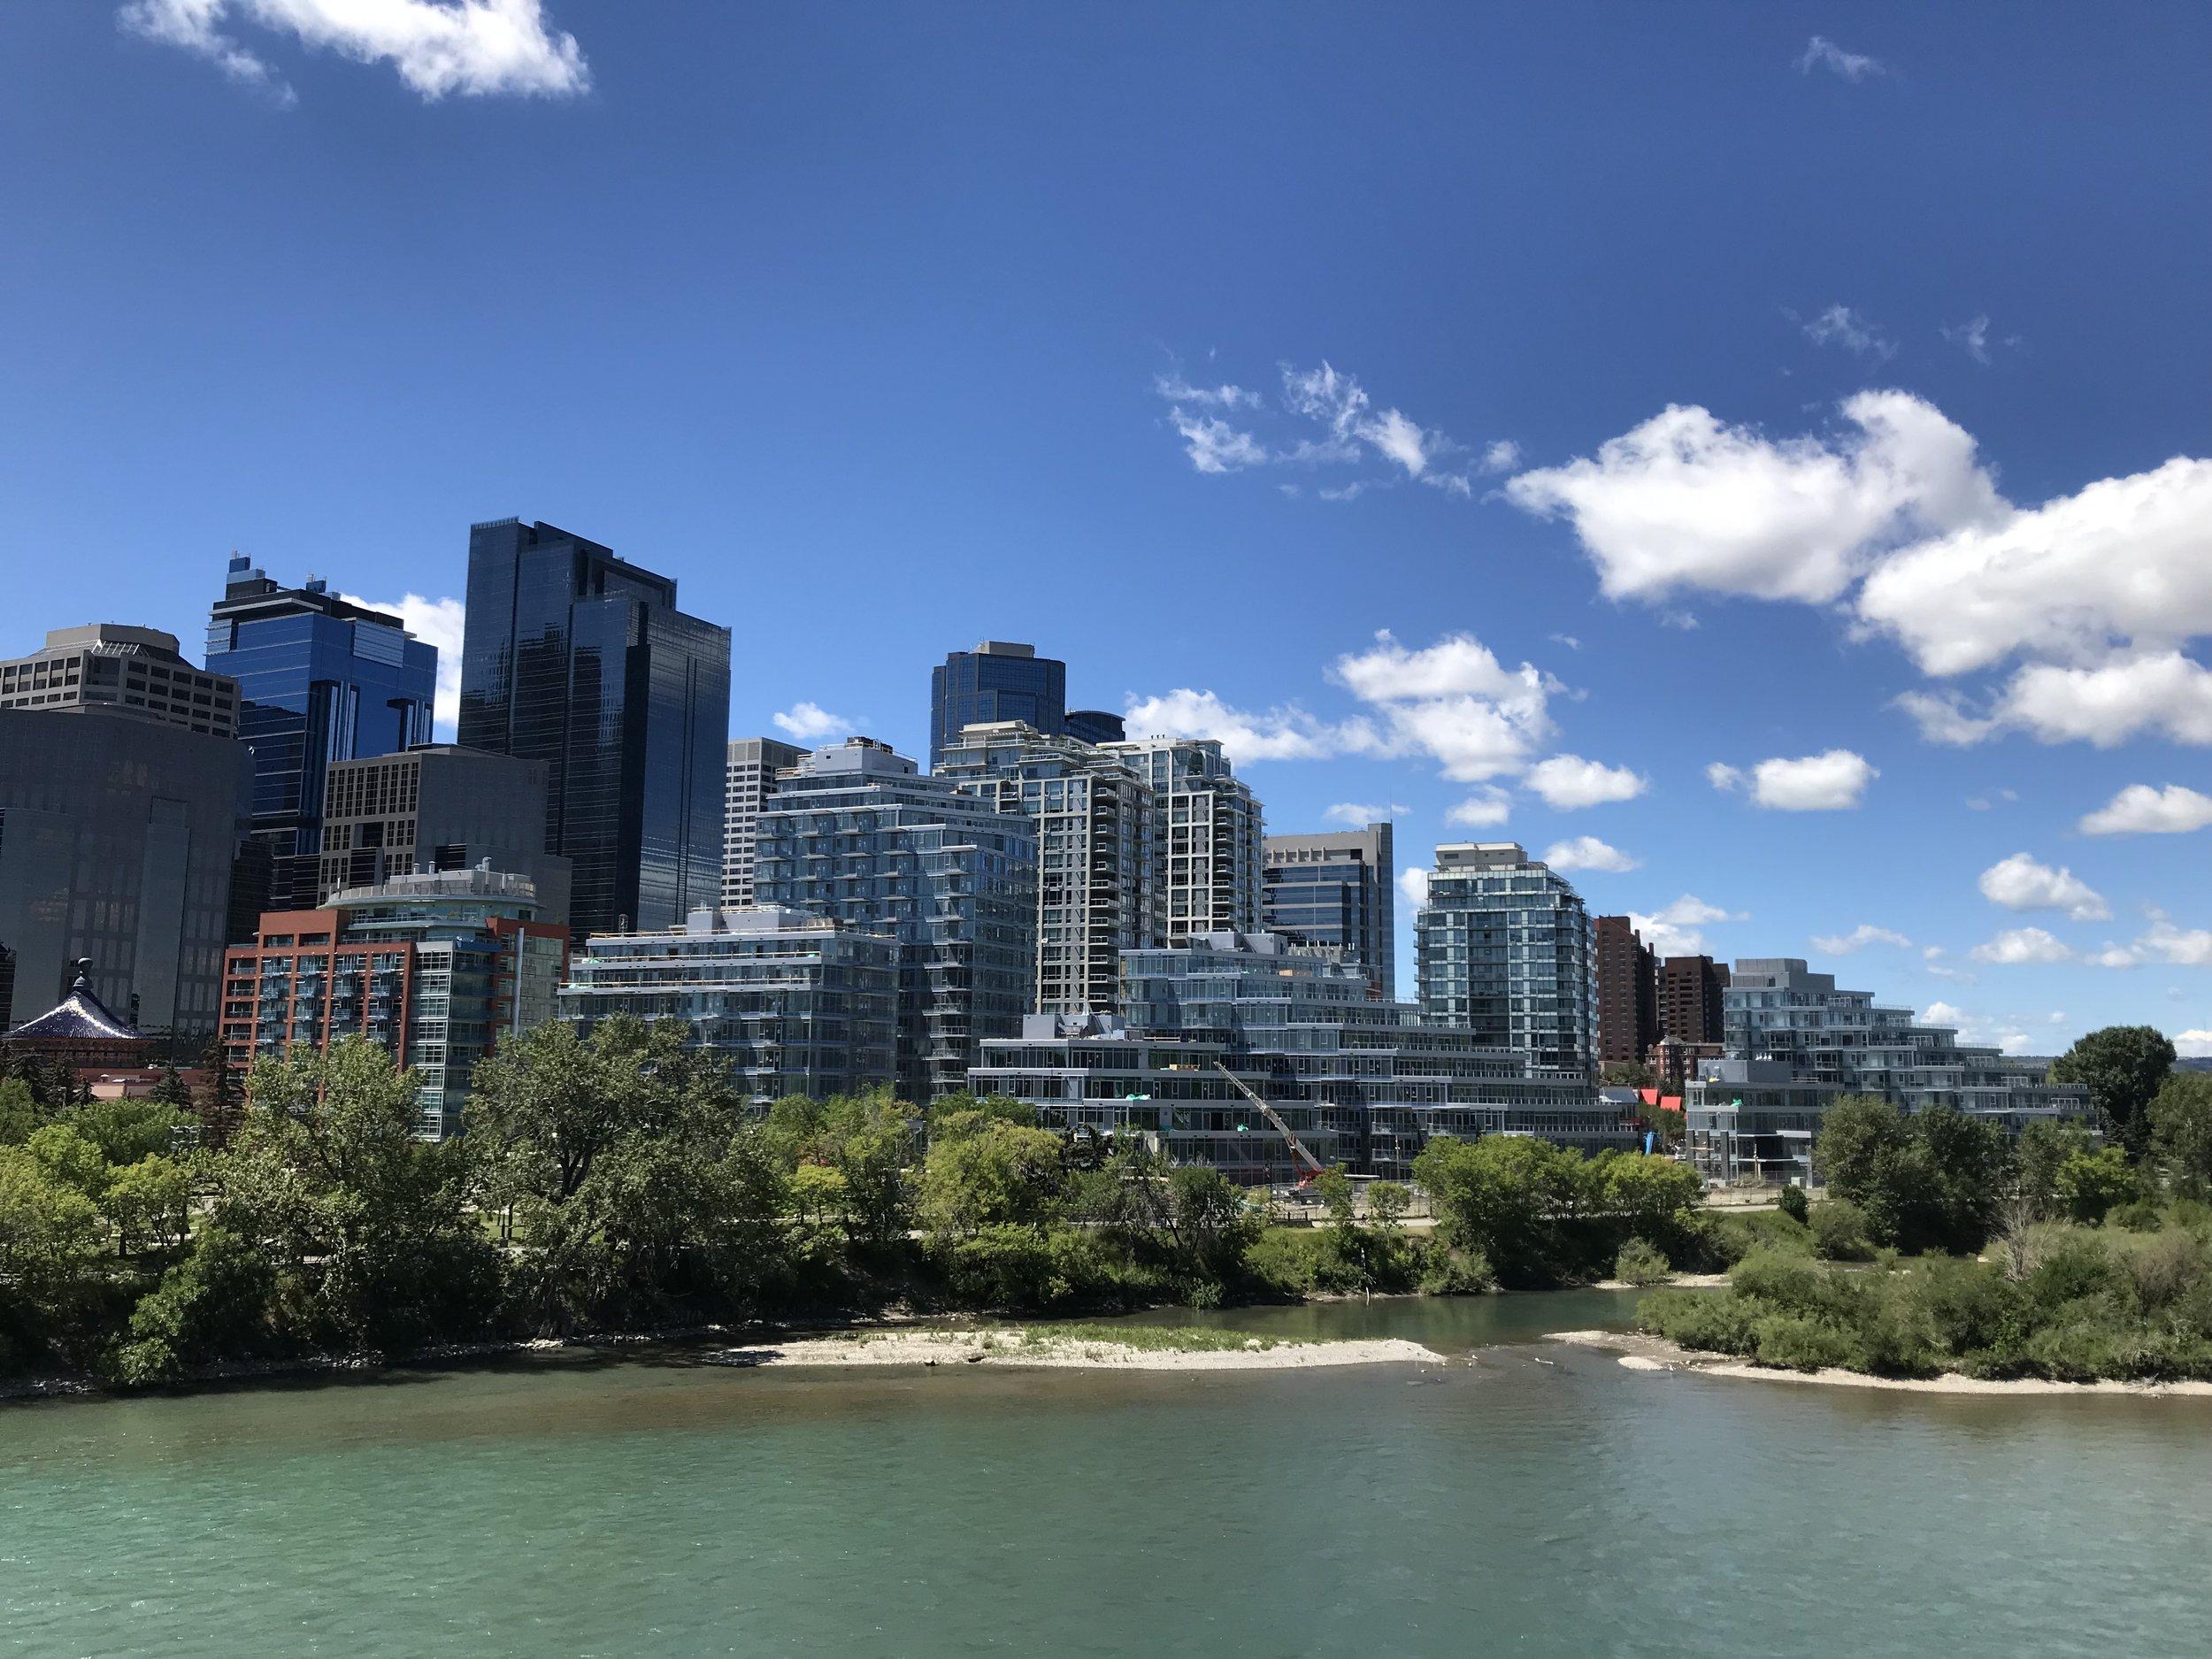 Calgary's Eau Claire shoreline.